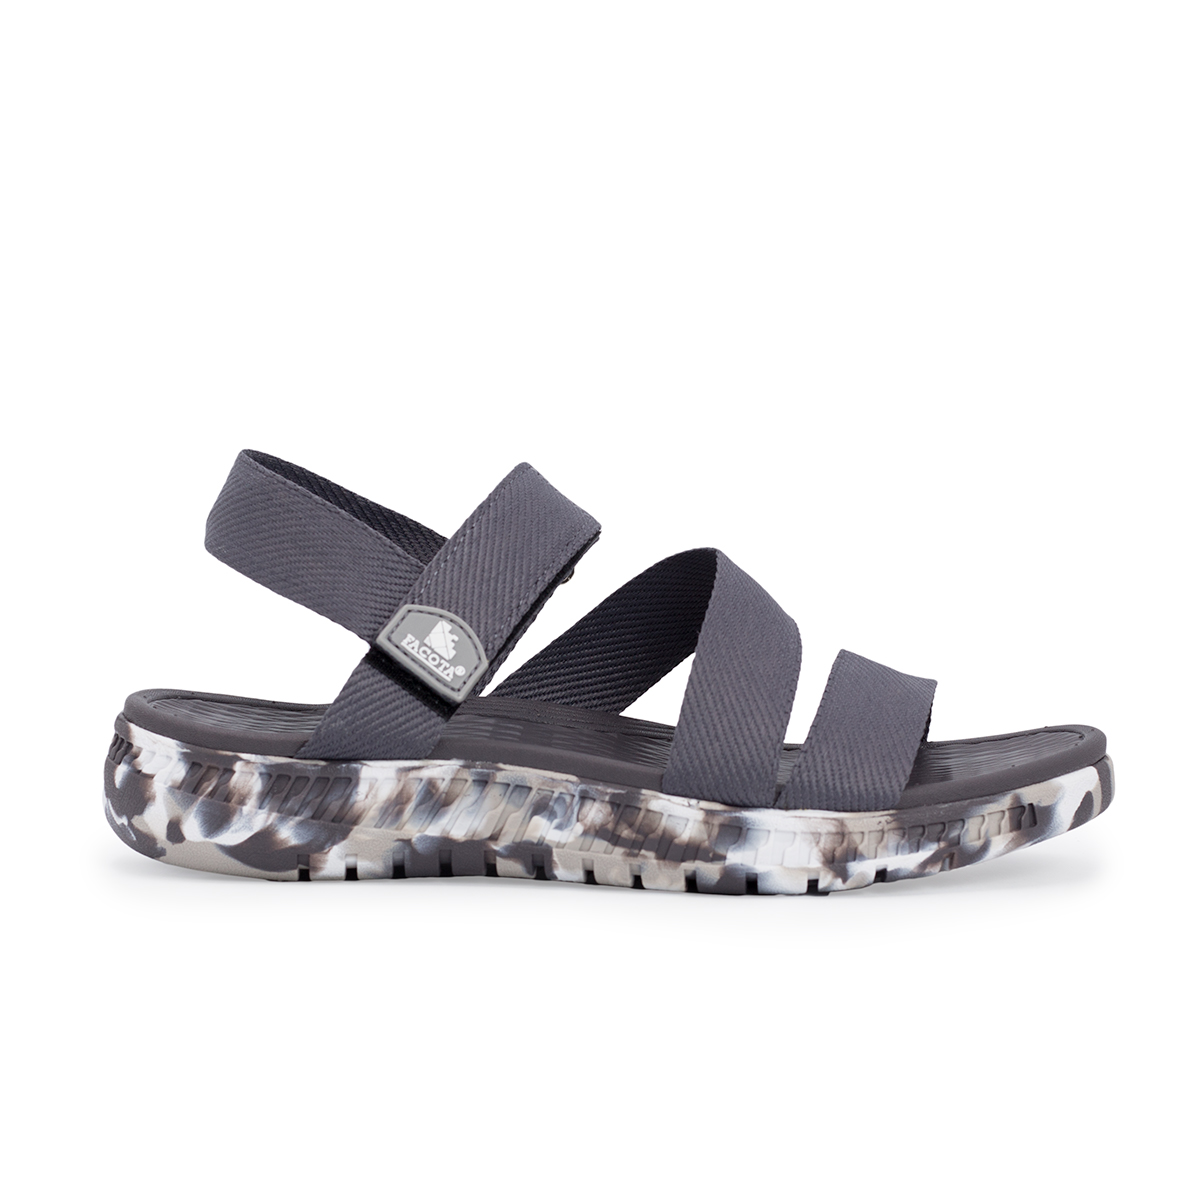 Giày sandal nam Facota V1 Sport HA15 sandal quai chéo camo - sandal quai dù